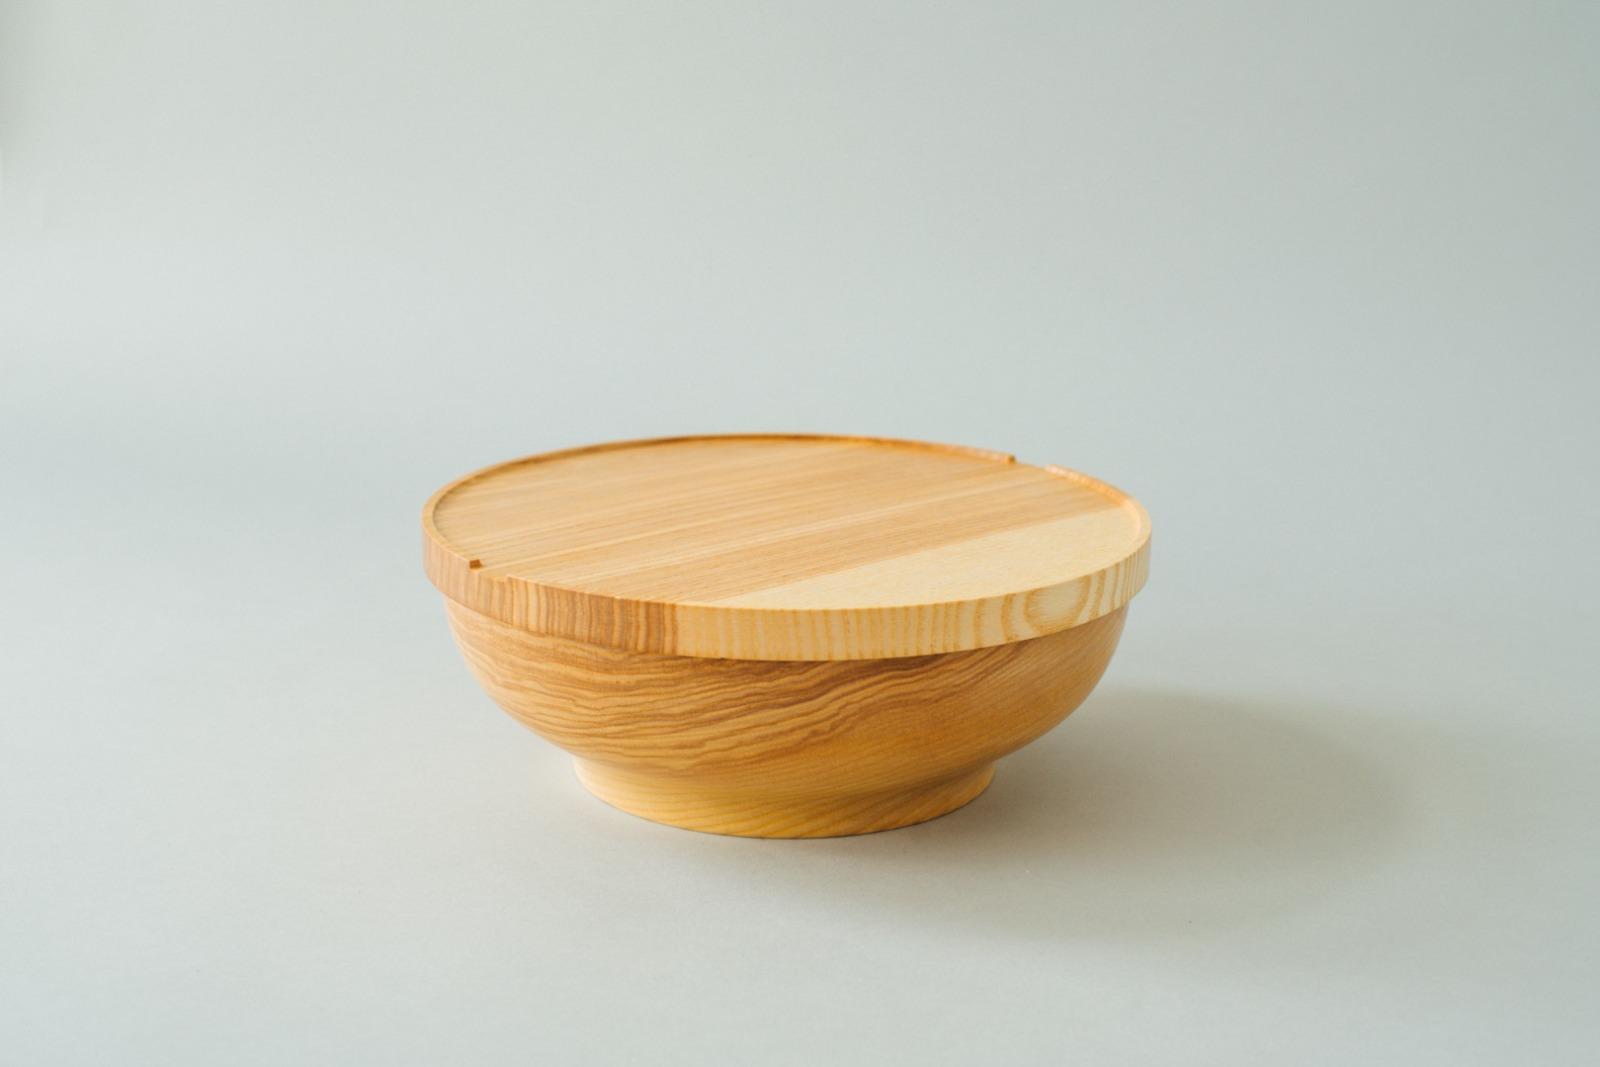 eshly deli deep bowl and cutting - 1